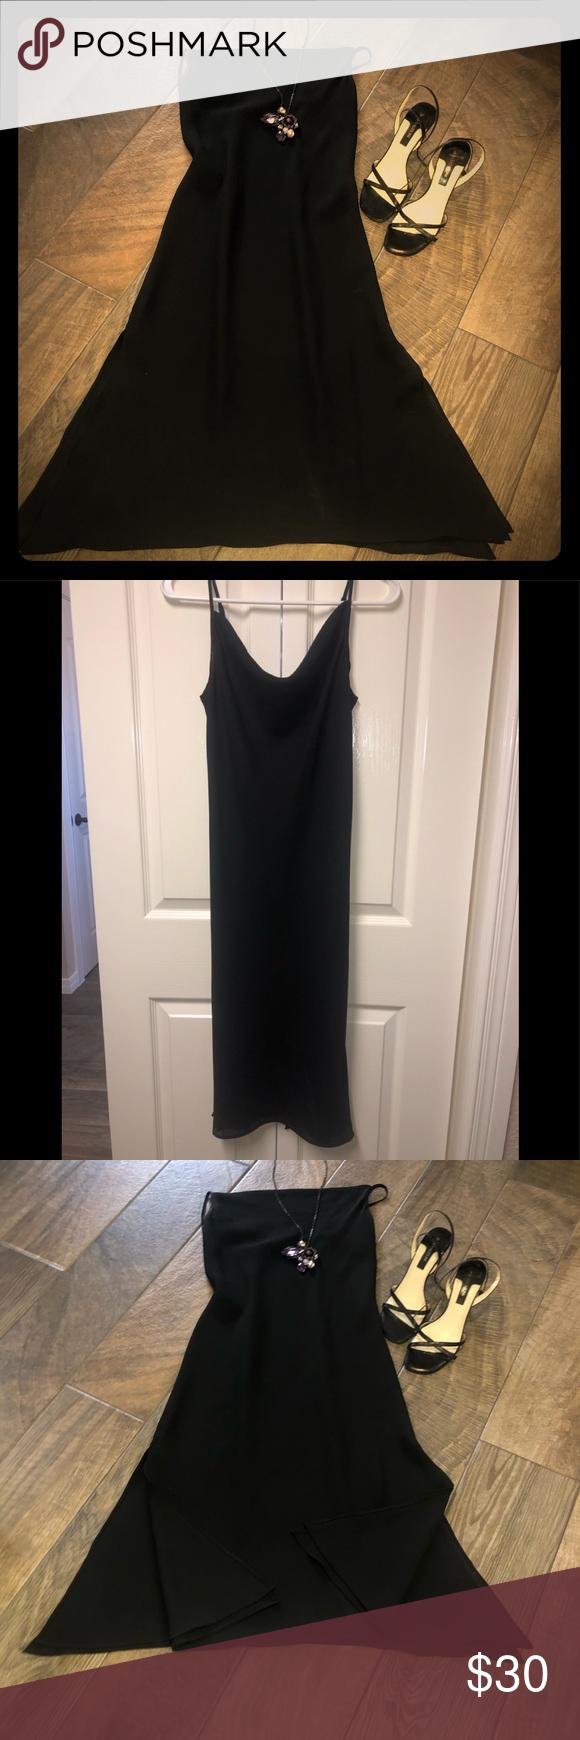 New York Company Black Dress Colorful Dresses Dresses Black Dress [ 1740 x 580 Pixel ]